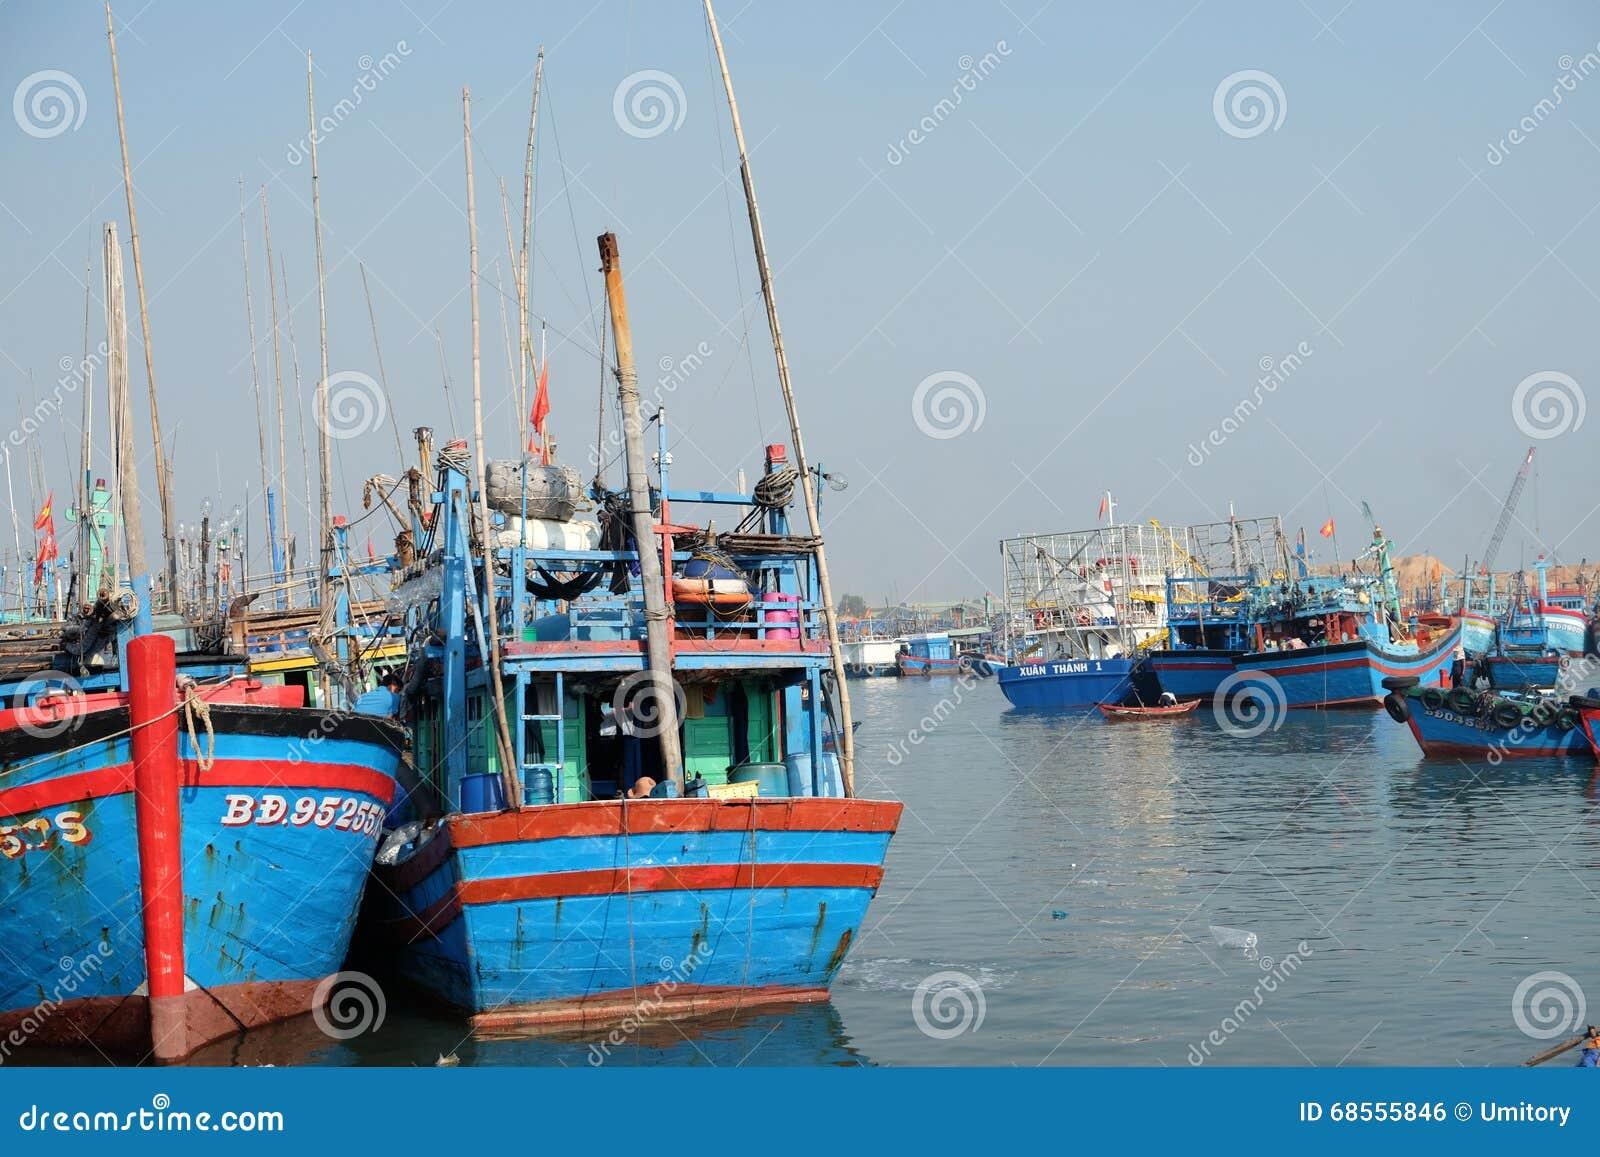 Boats At Qui Nhon Fish Port Vietnam In The Morning Editorial Photo Image 68555846